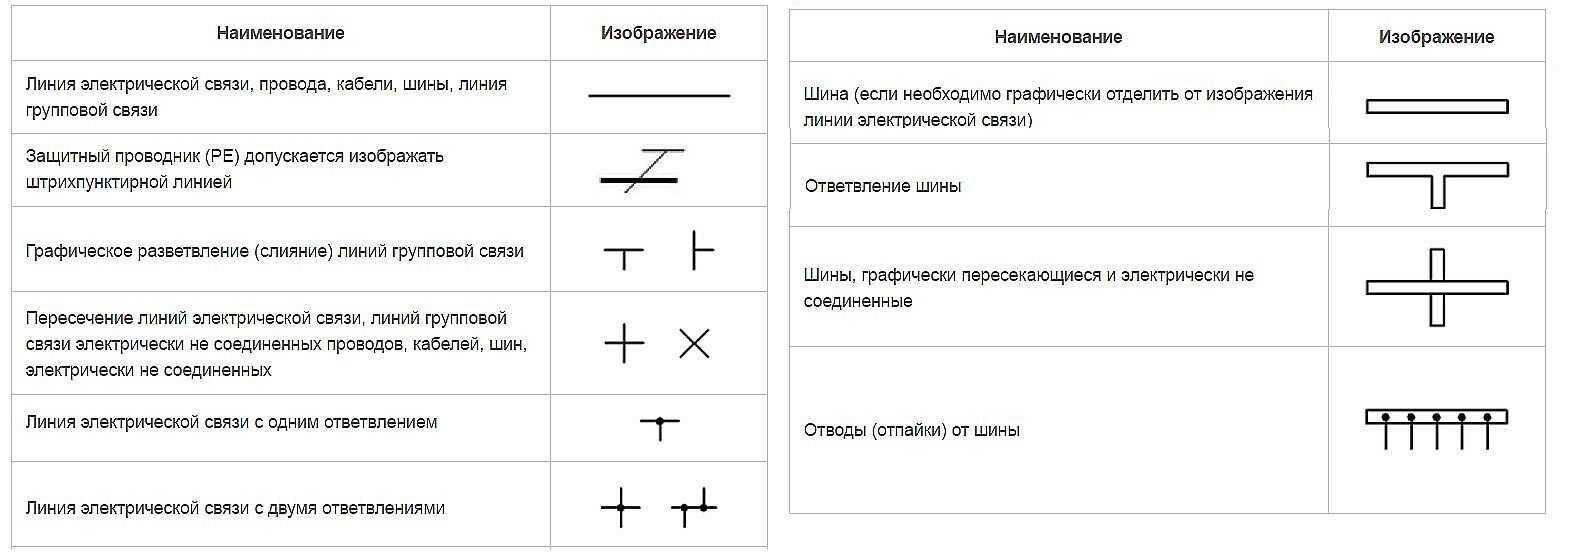 Перевод электрических схем